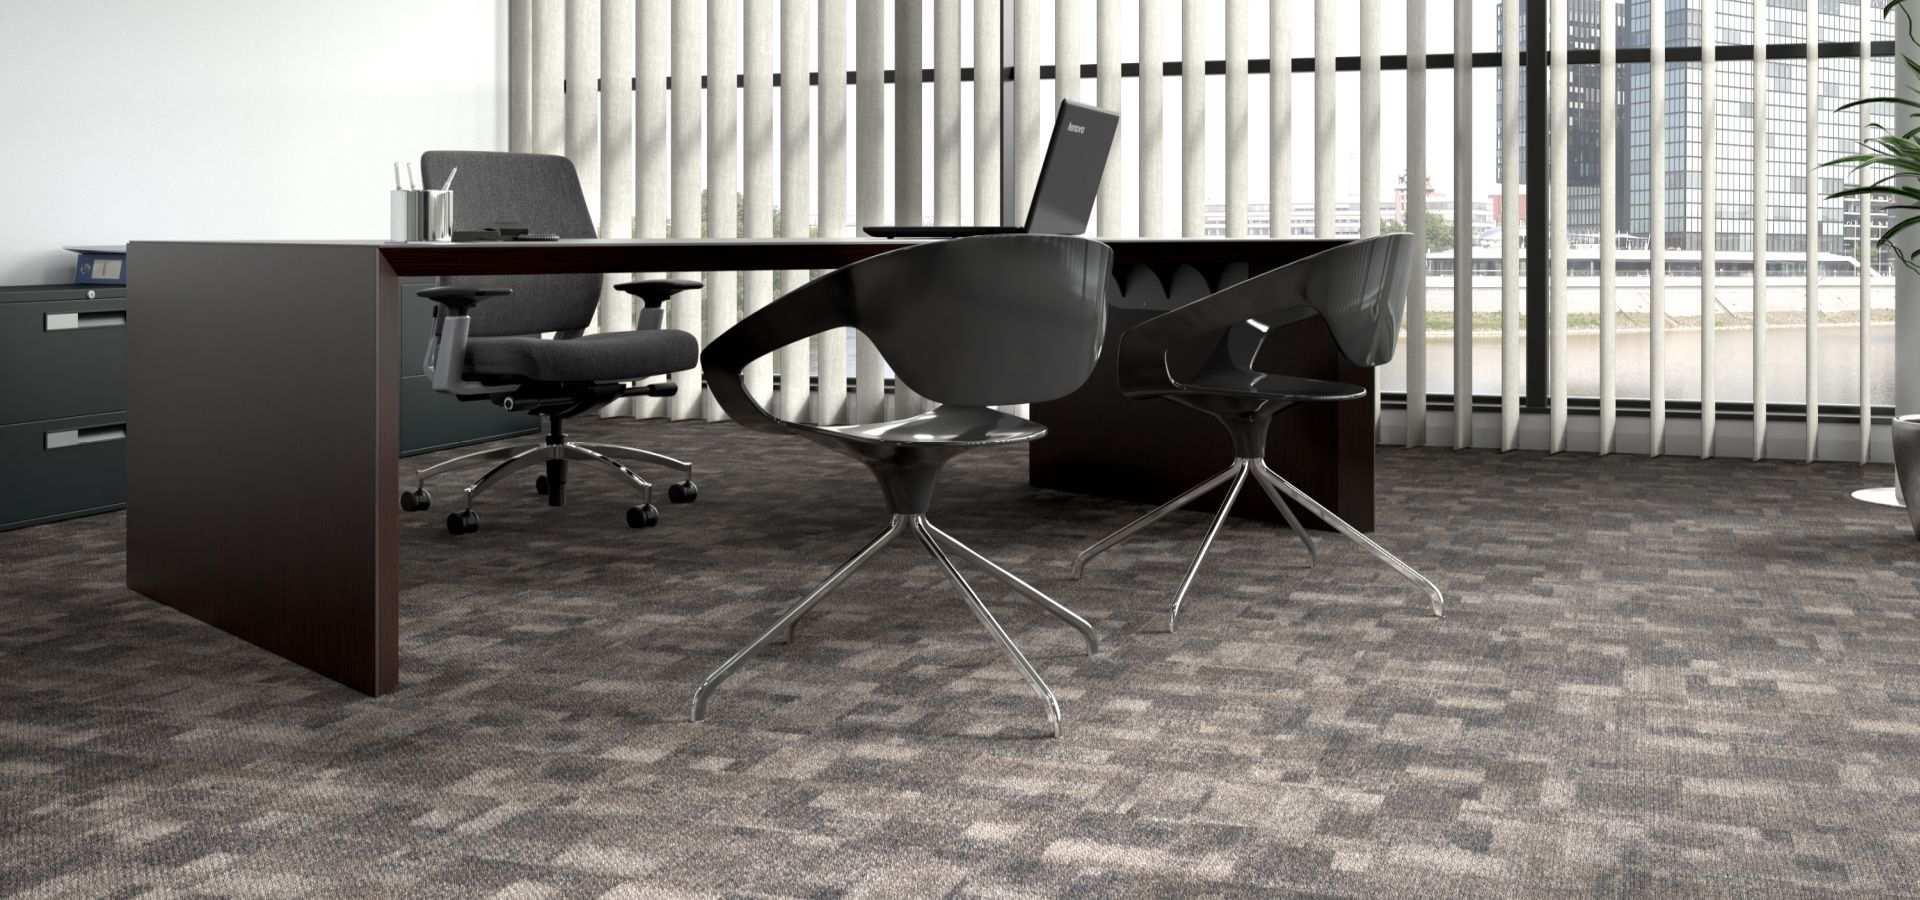 Bild Office Teppichboden Planke in Büro grau Patchwork